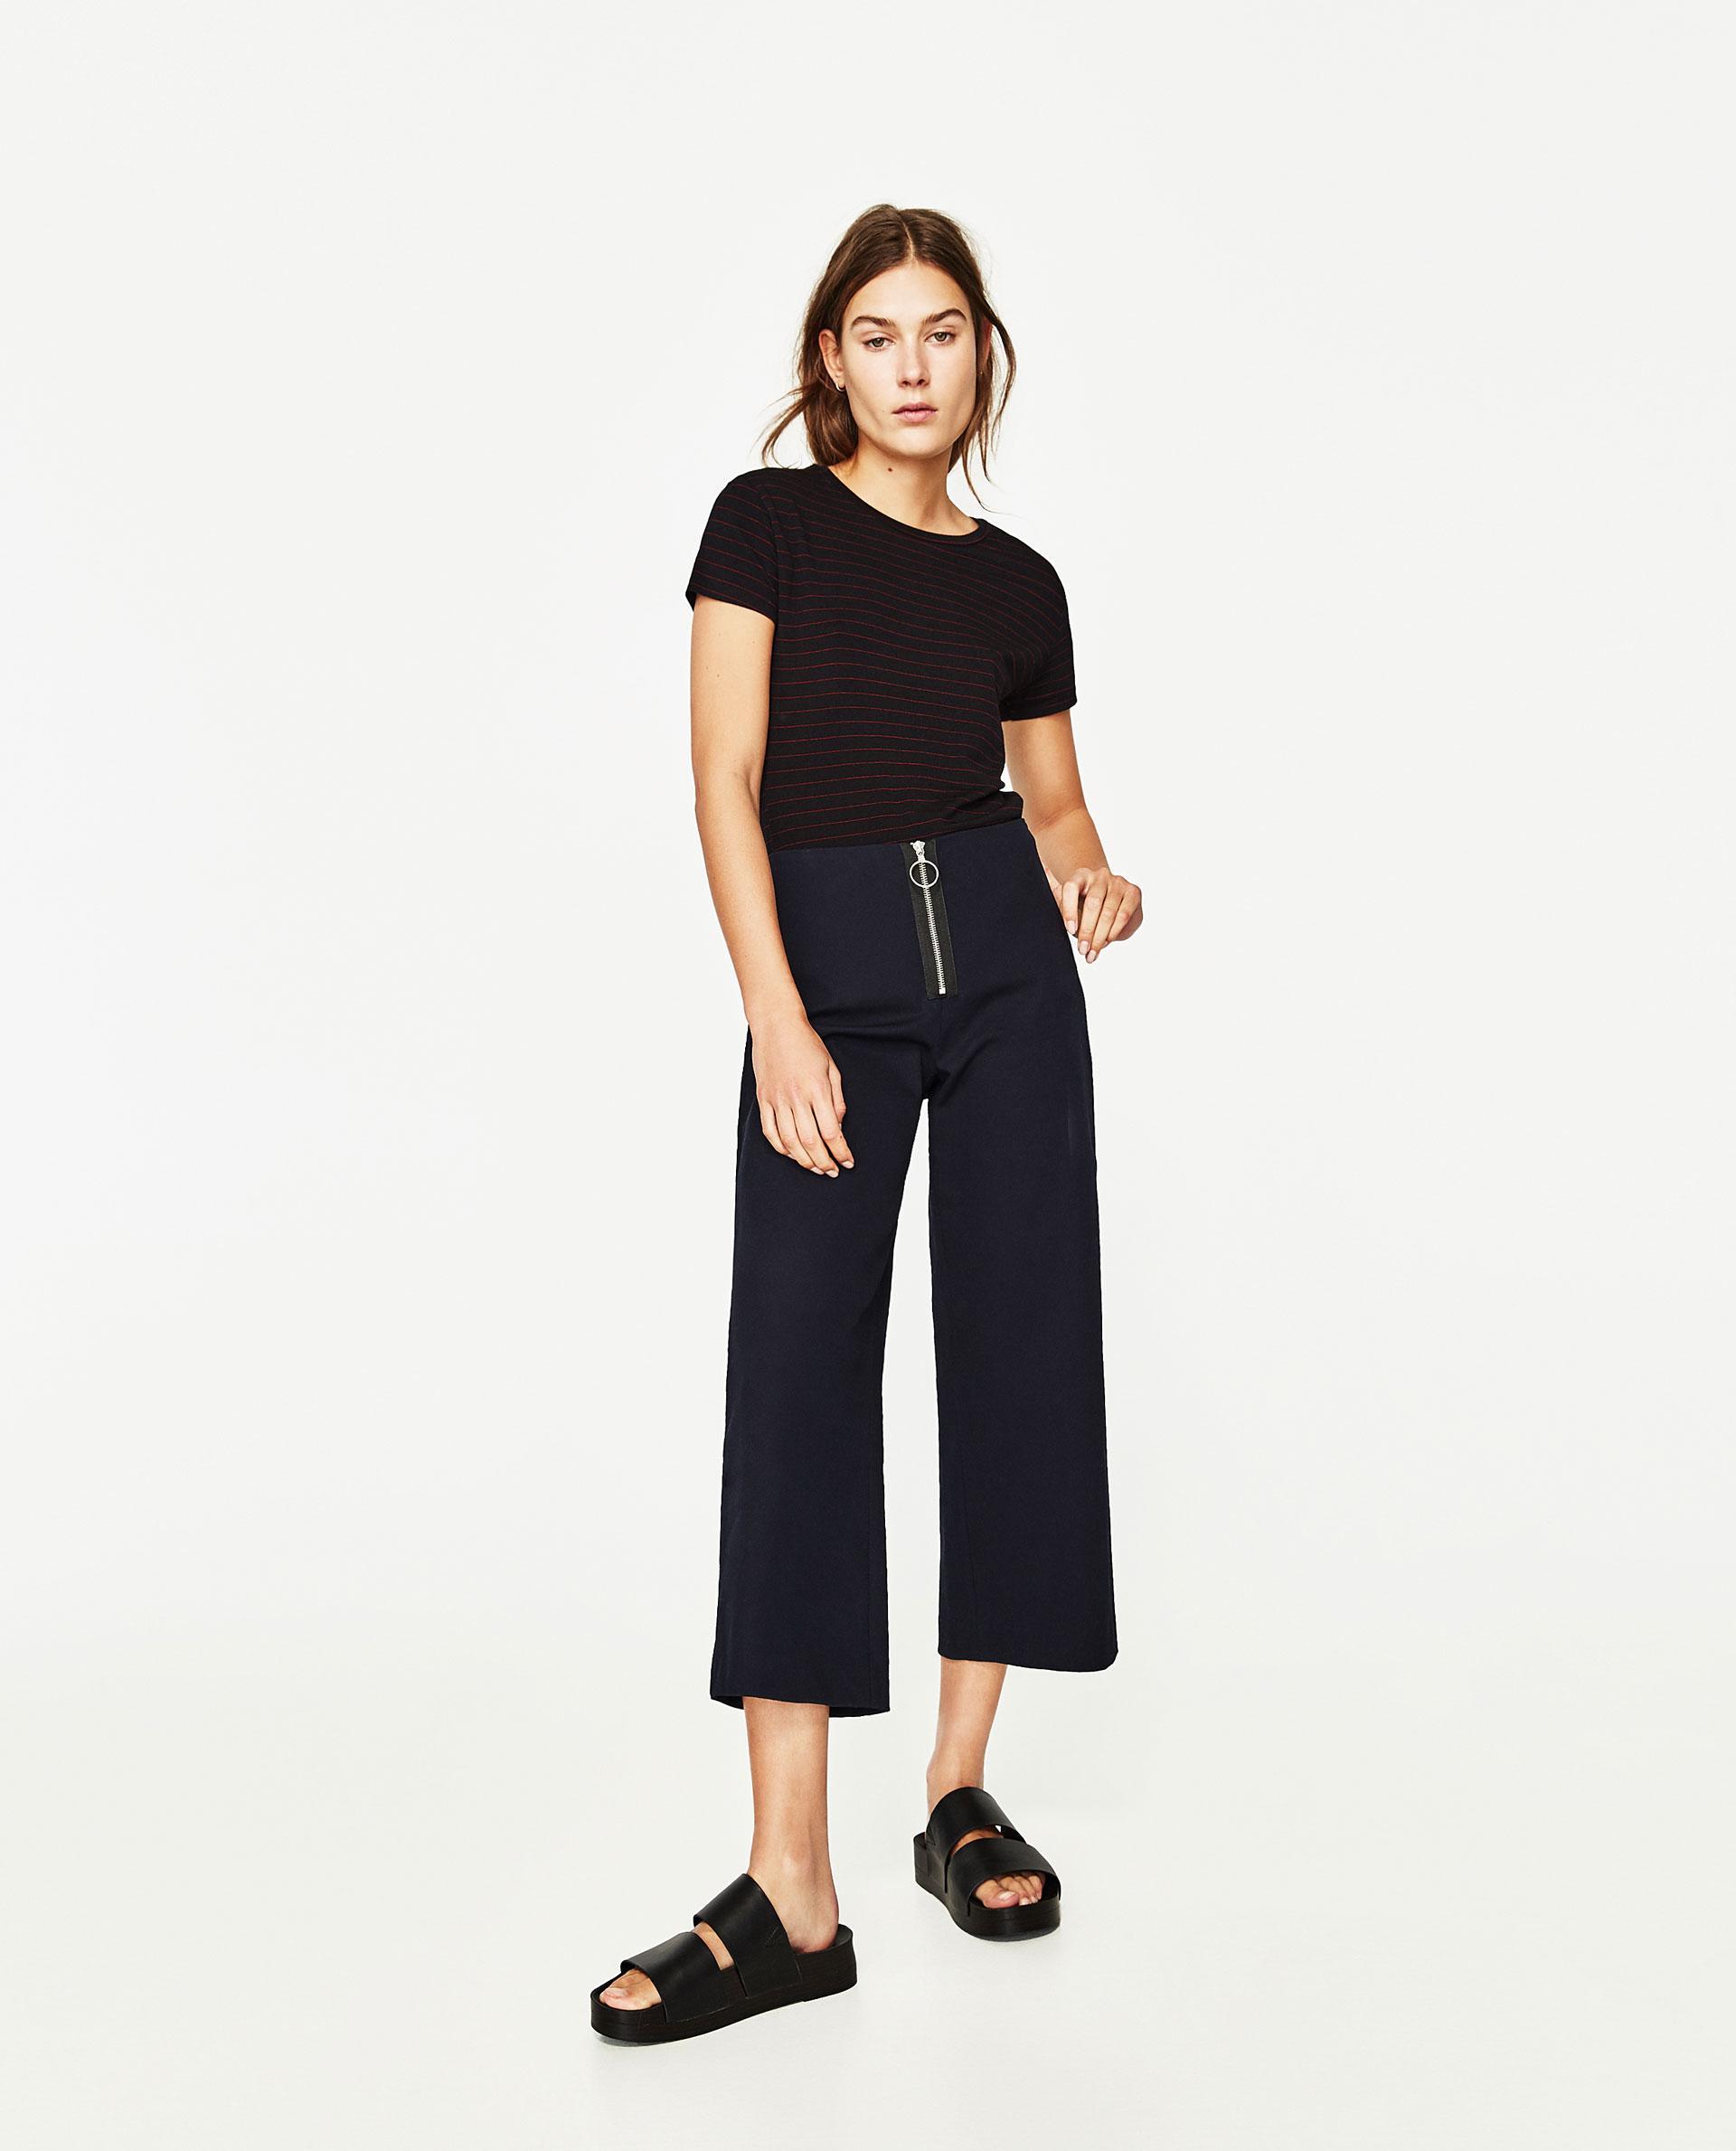 Zara basic t shirt in black lyst for Zara black t shirt dress